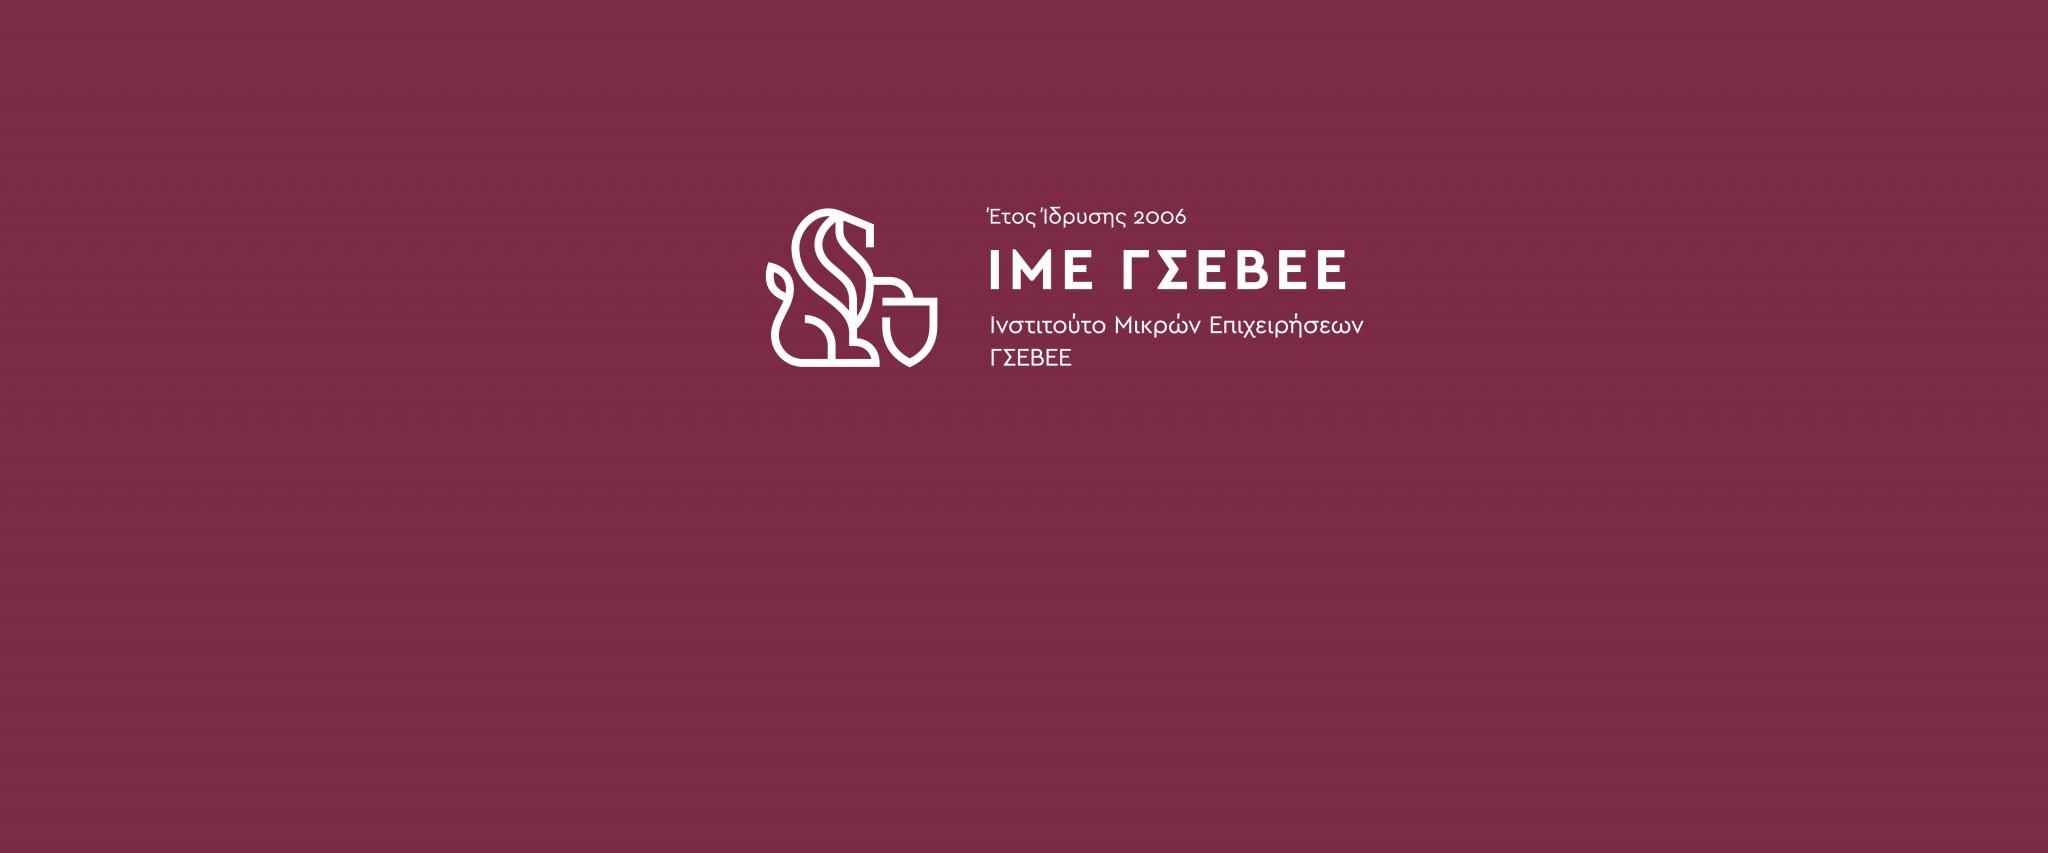 ime gsevee, new logo, λογότυπο ΙΜΕ ΓΣΕΒΕΕ